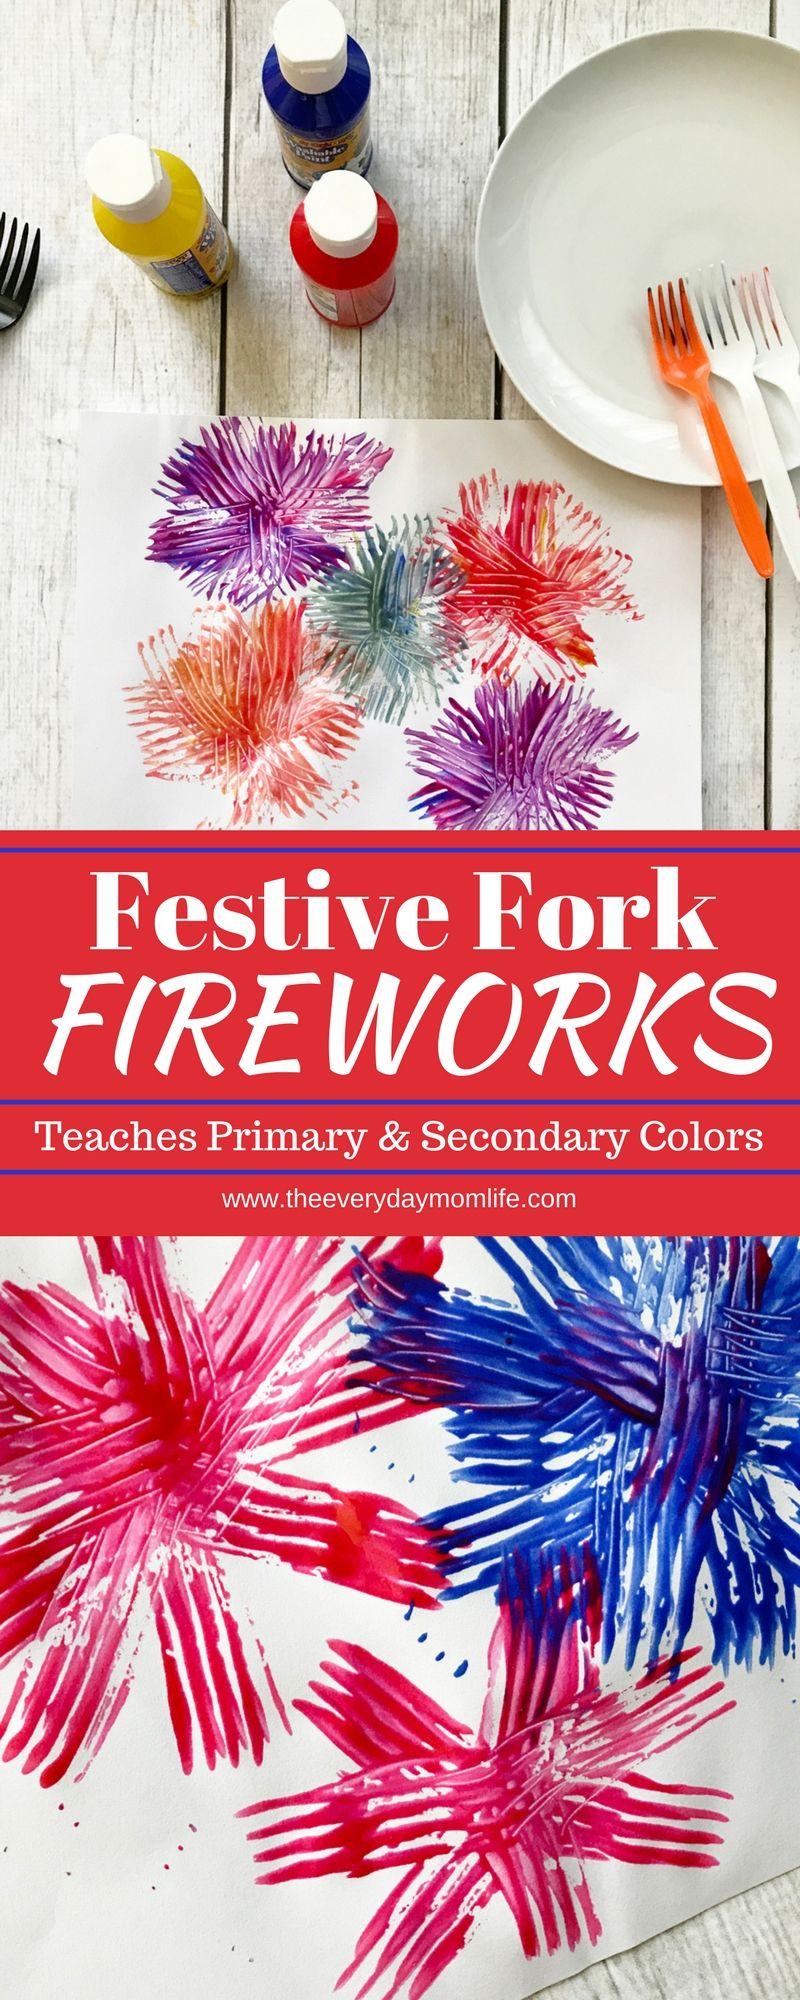 Festive Fireworks 4th of July Craft